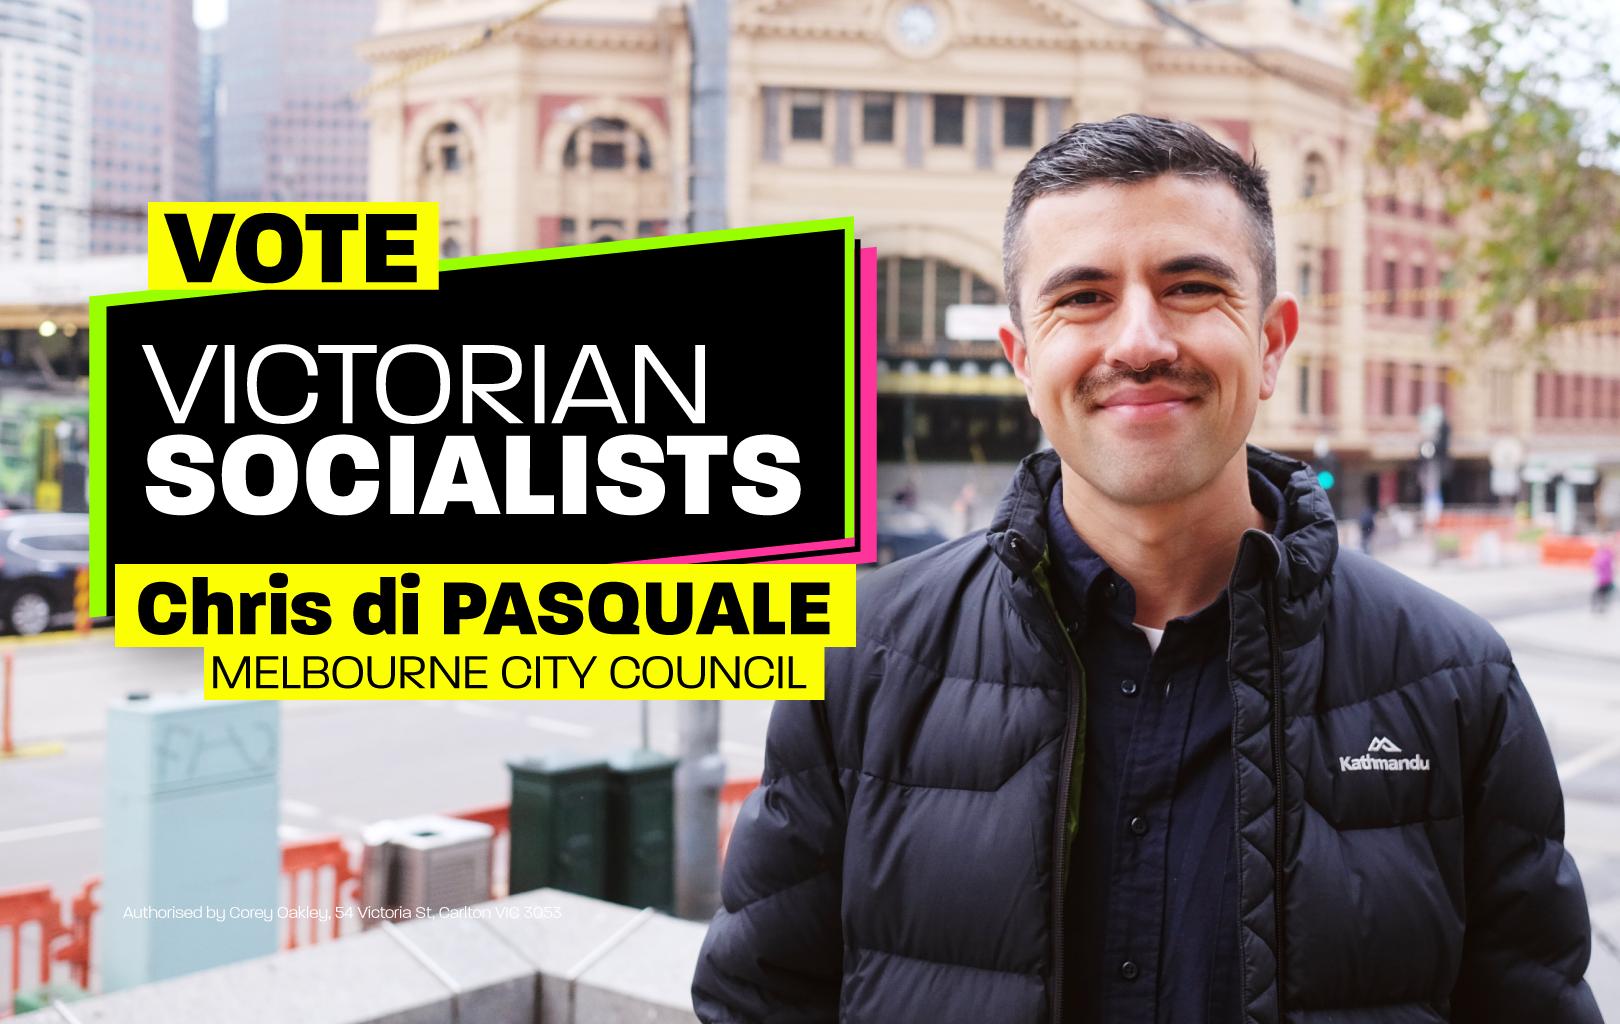 Chris Di Pasquale